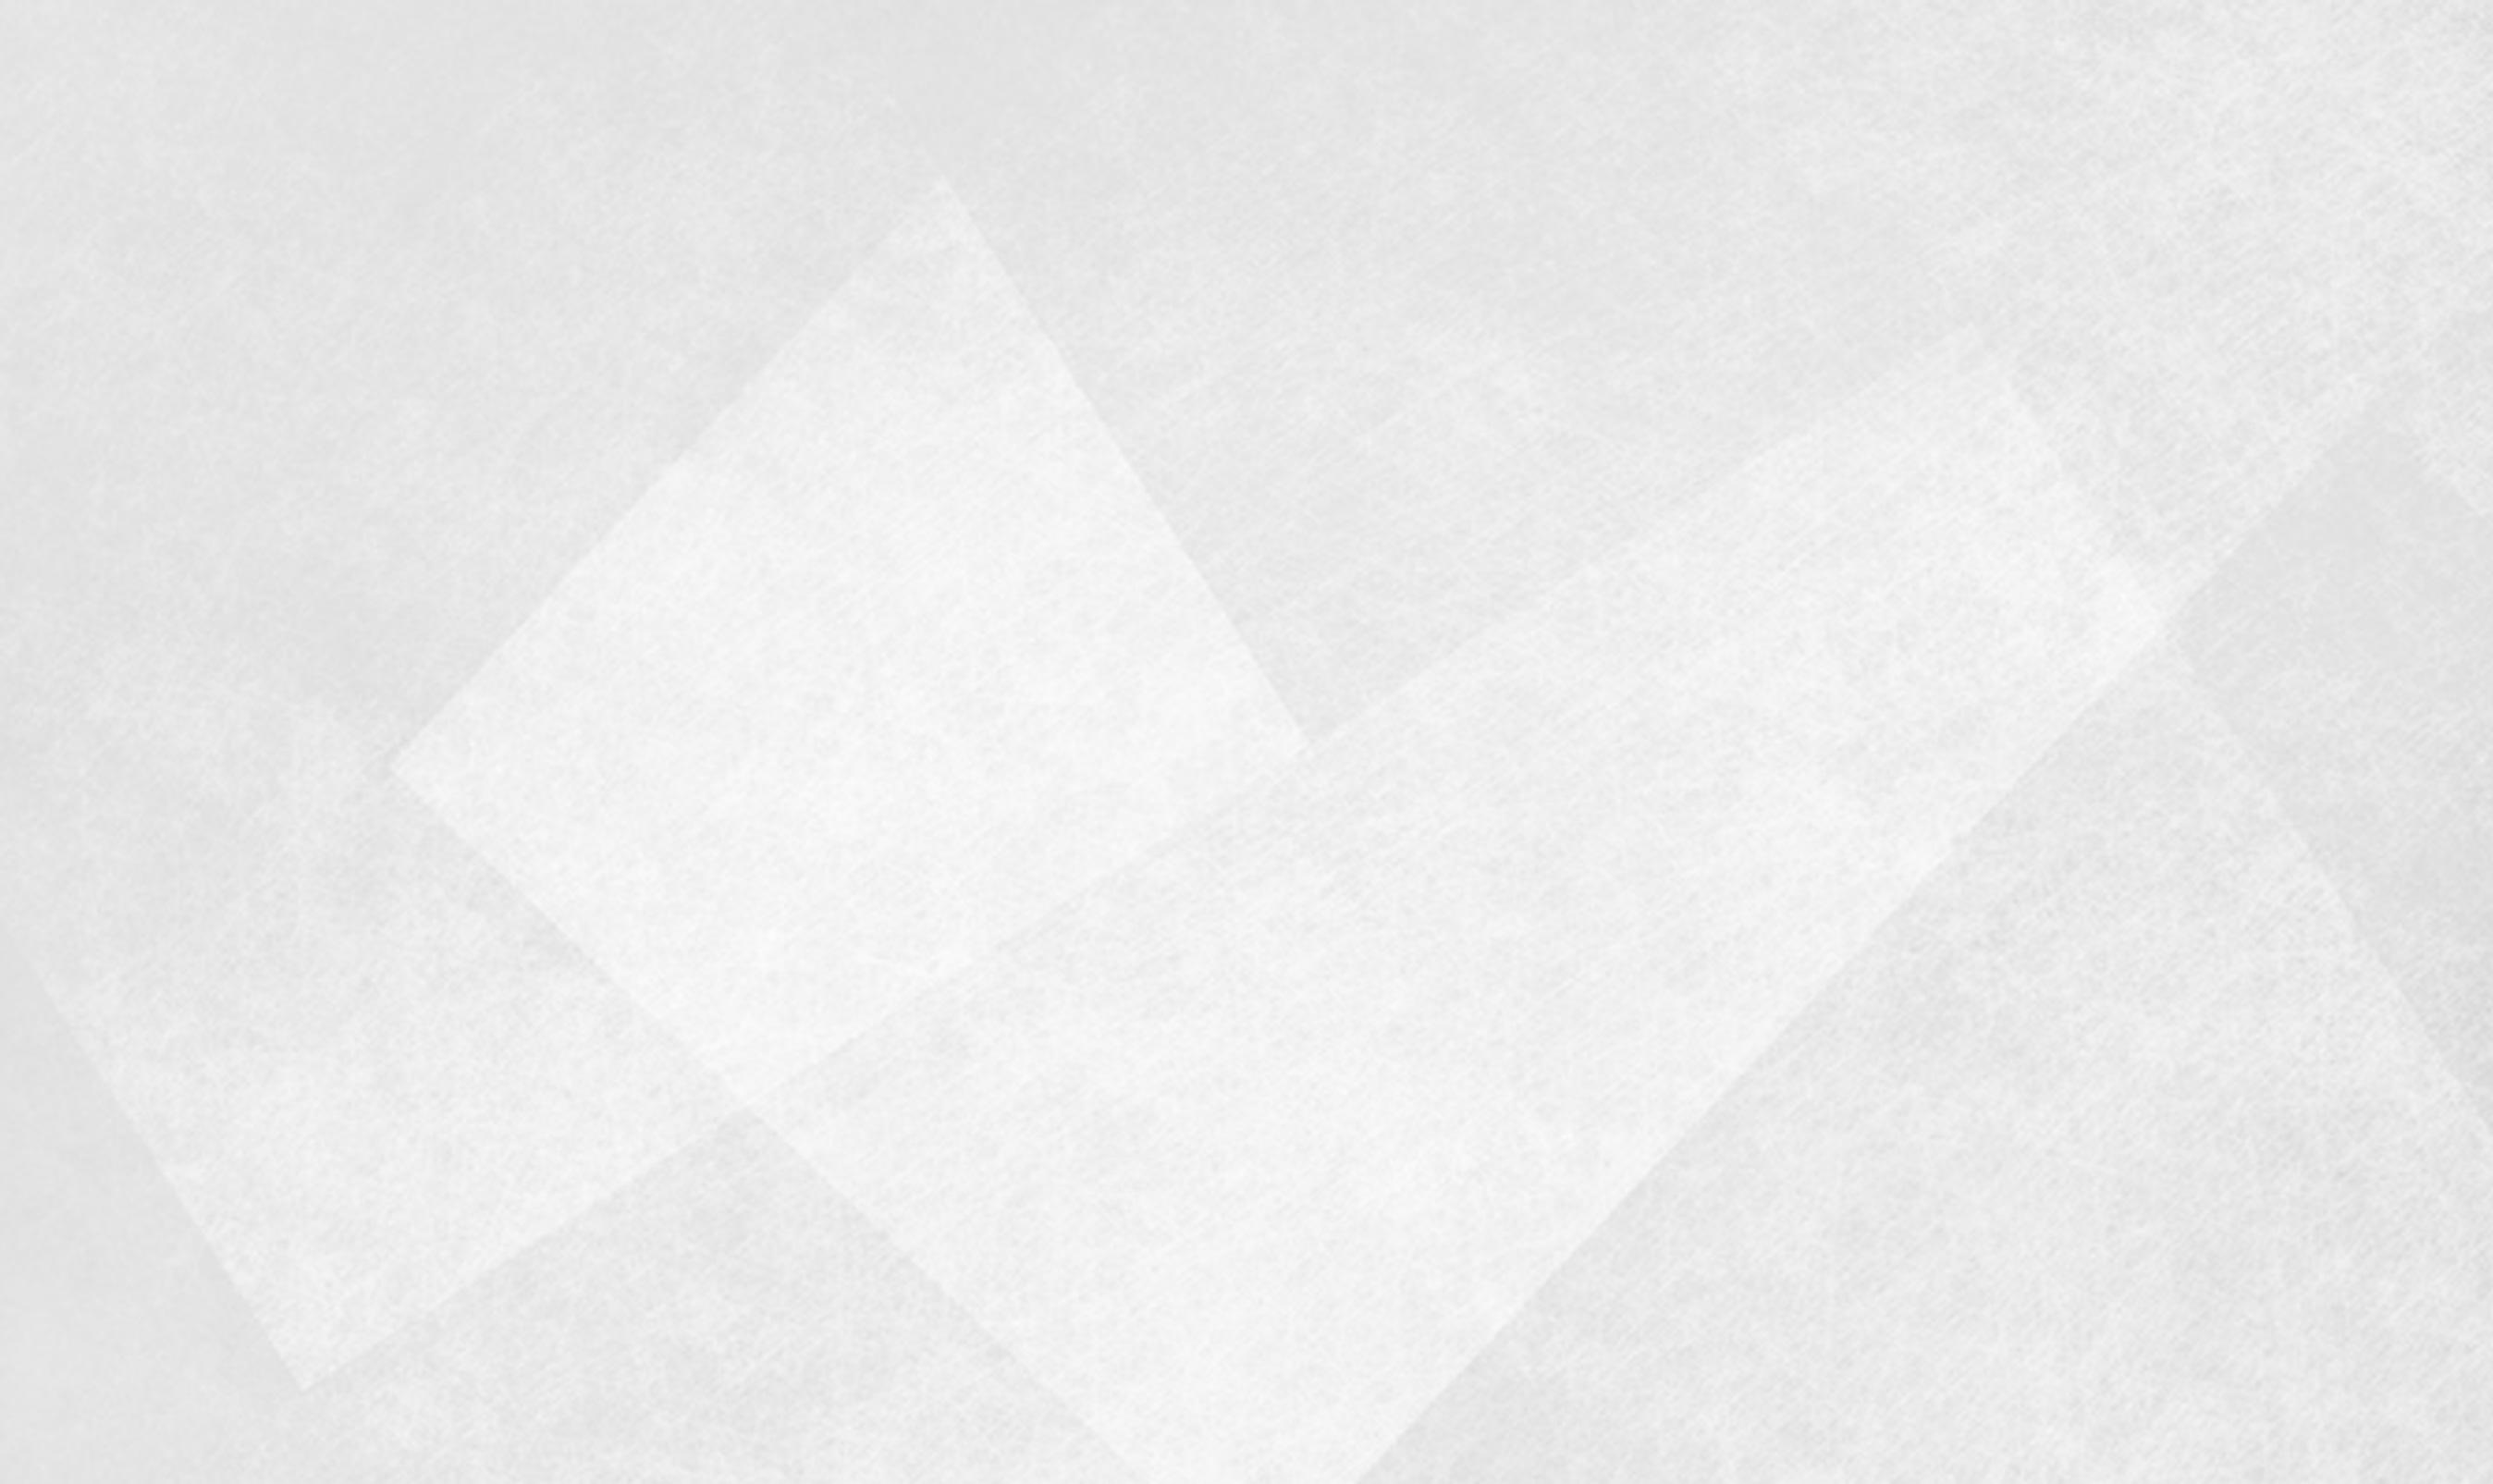 brunsia-web-gray-banner